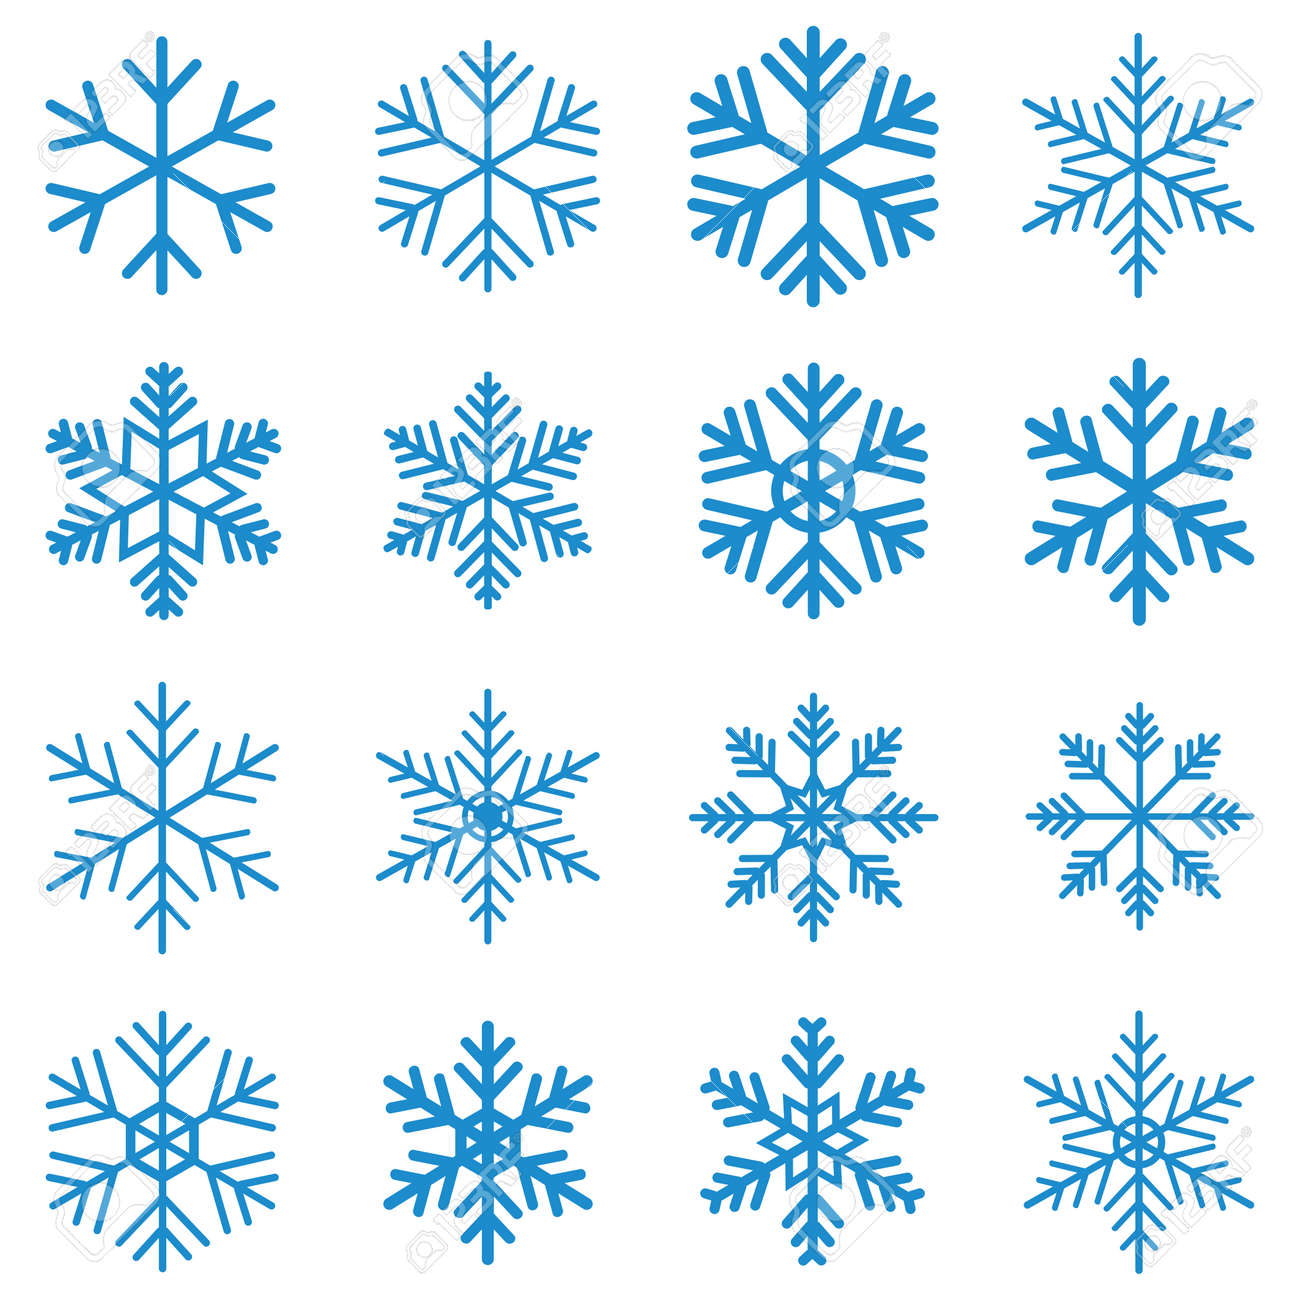 snowflake icon vector design symbol - 143132579